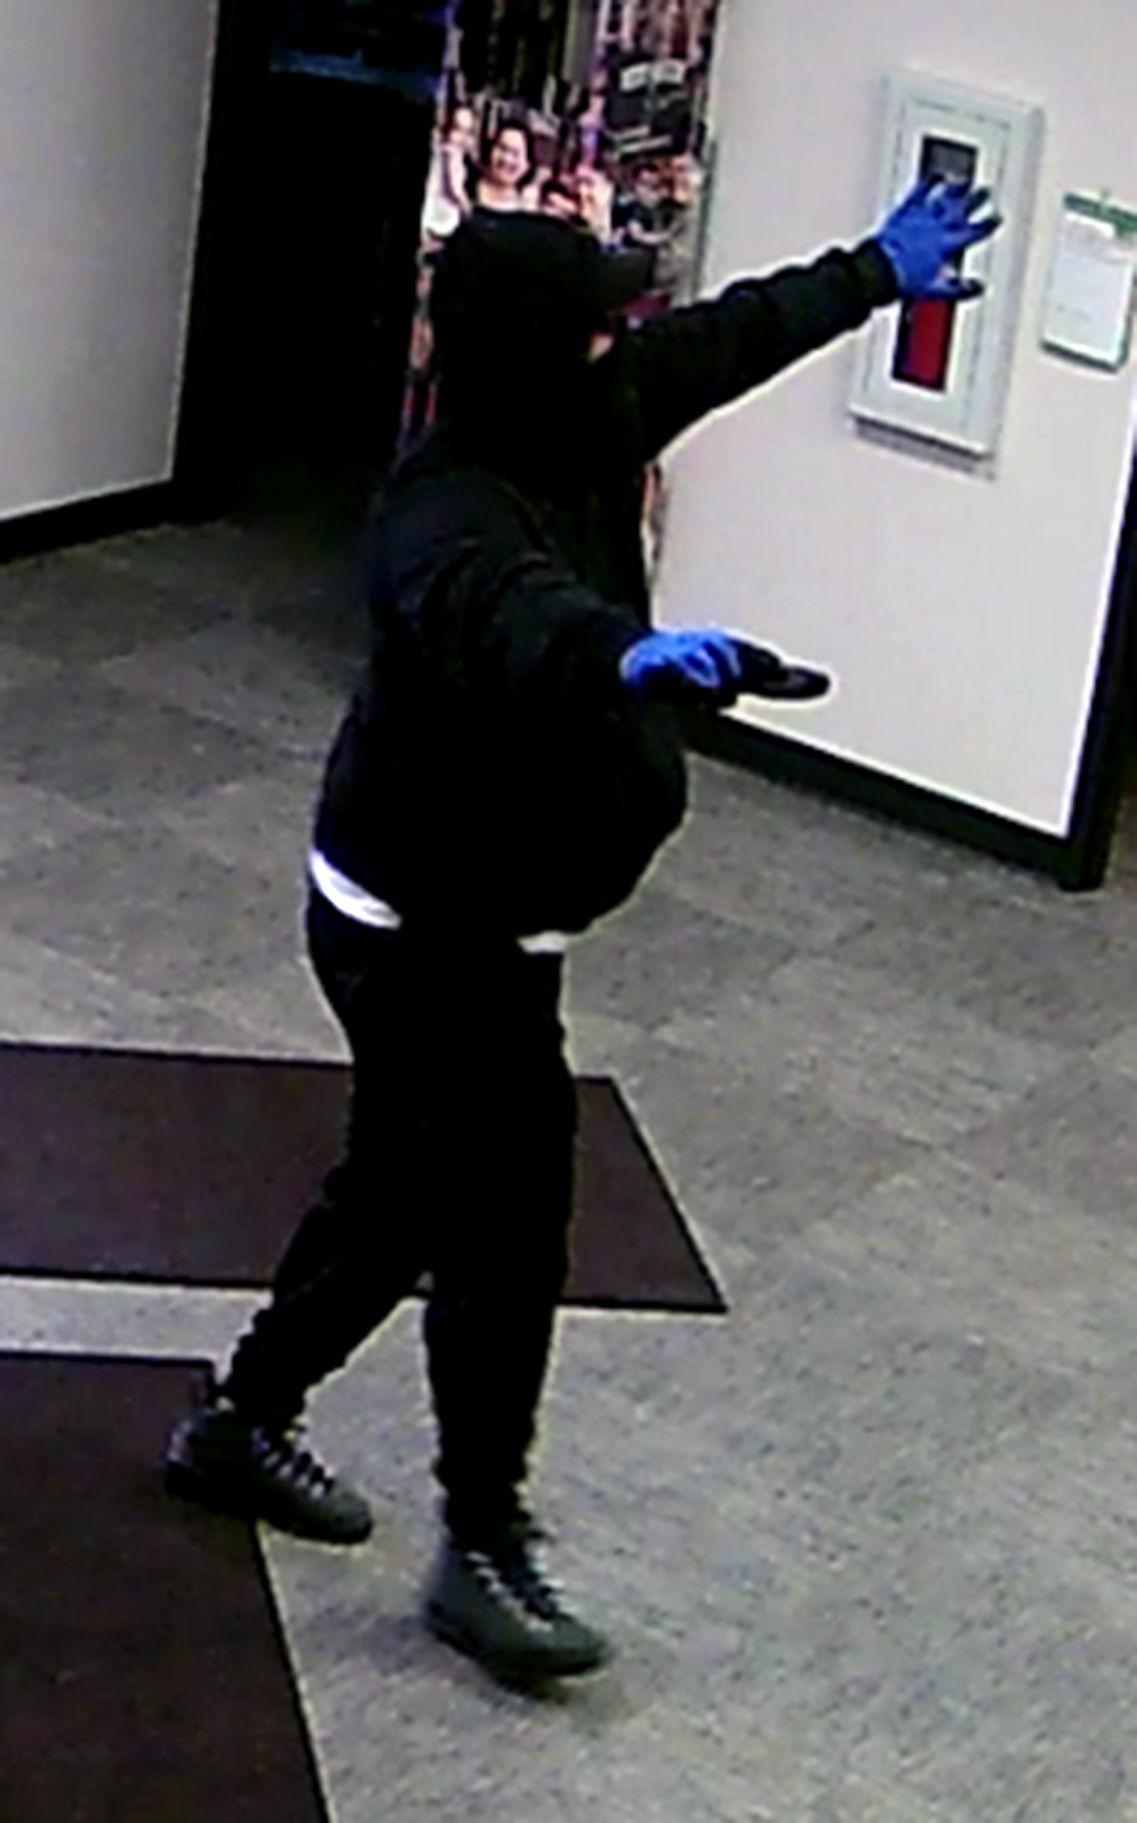 Robbery suspect on camera